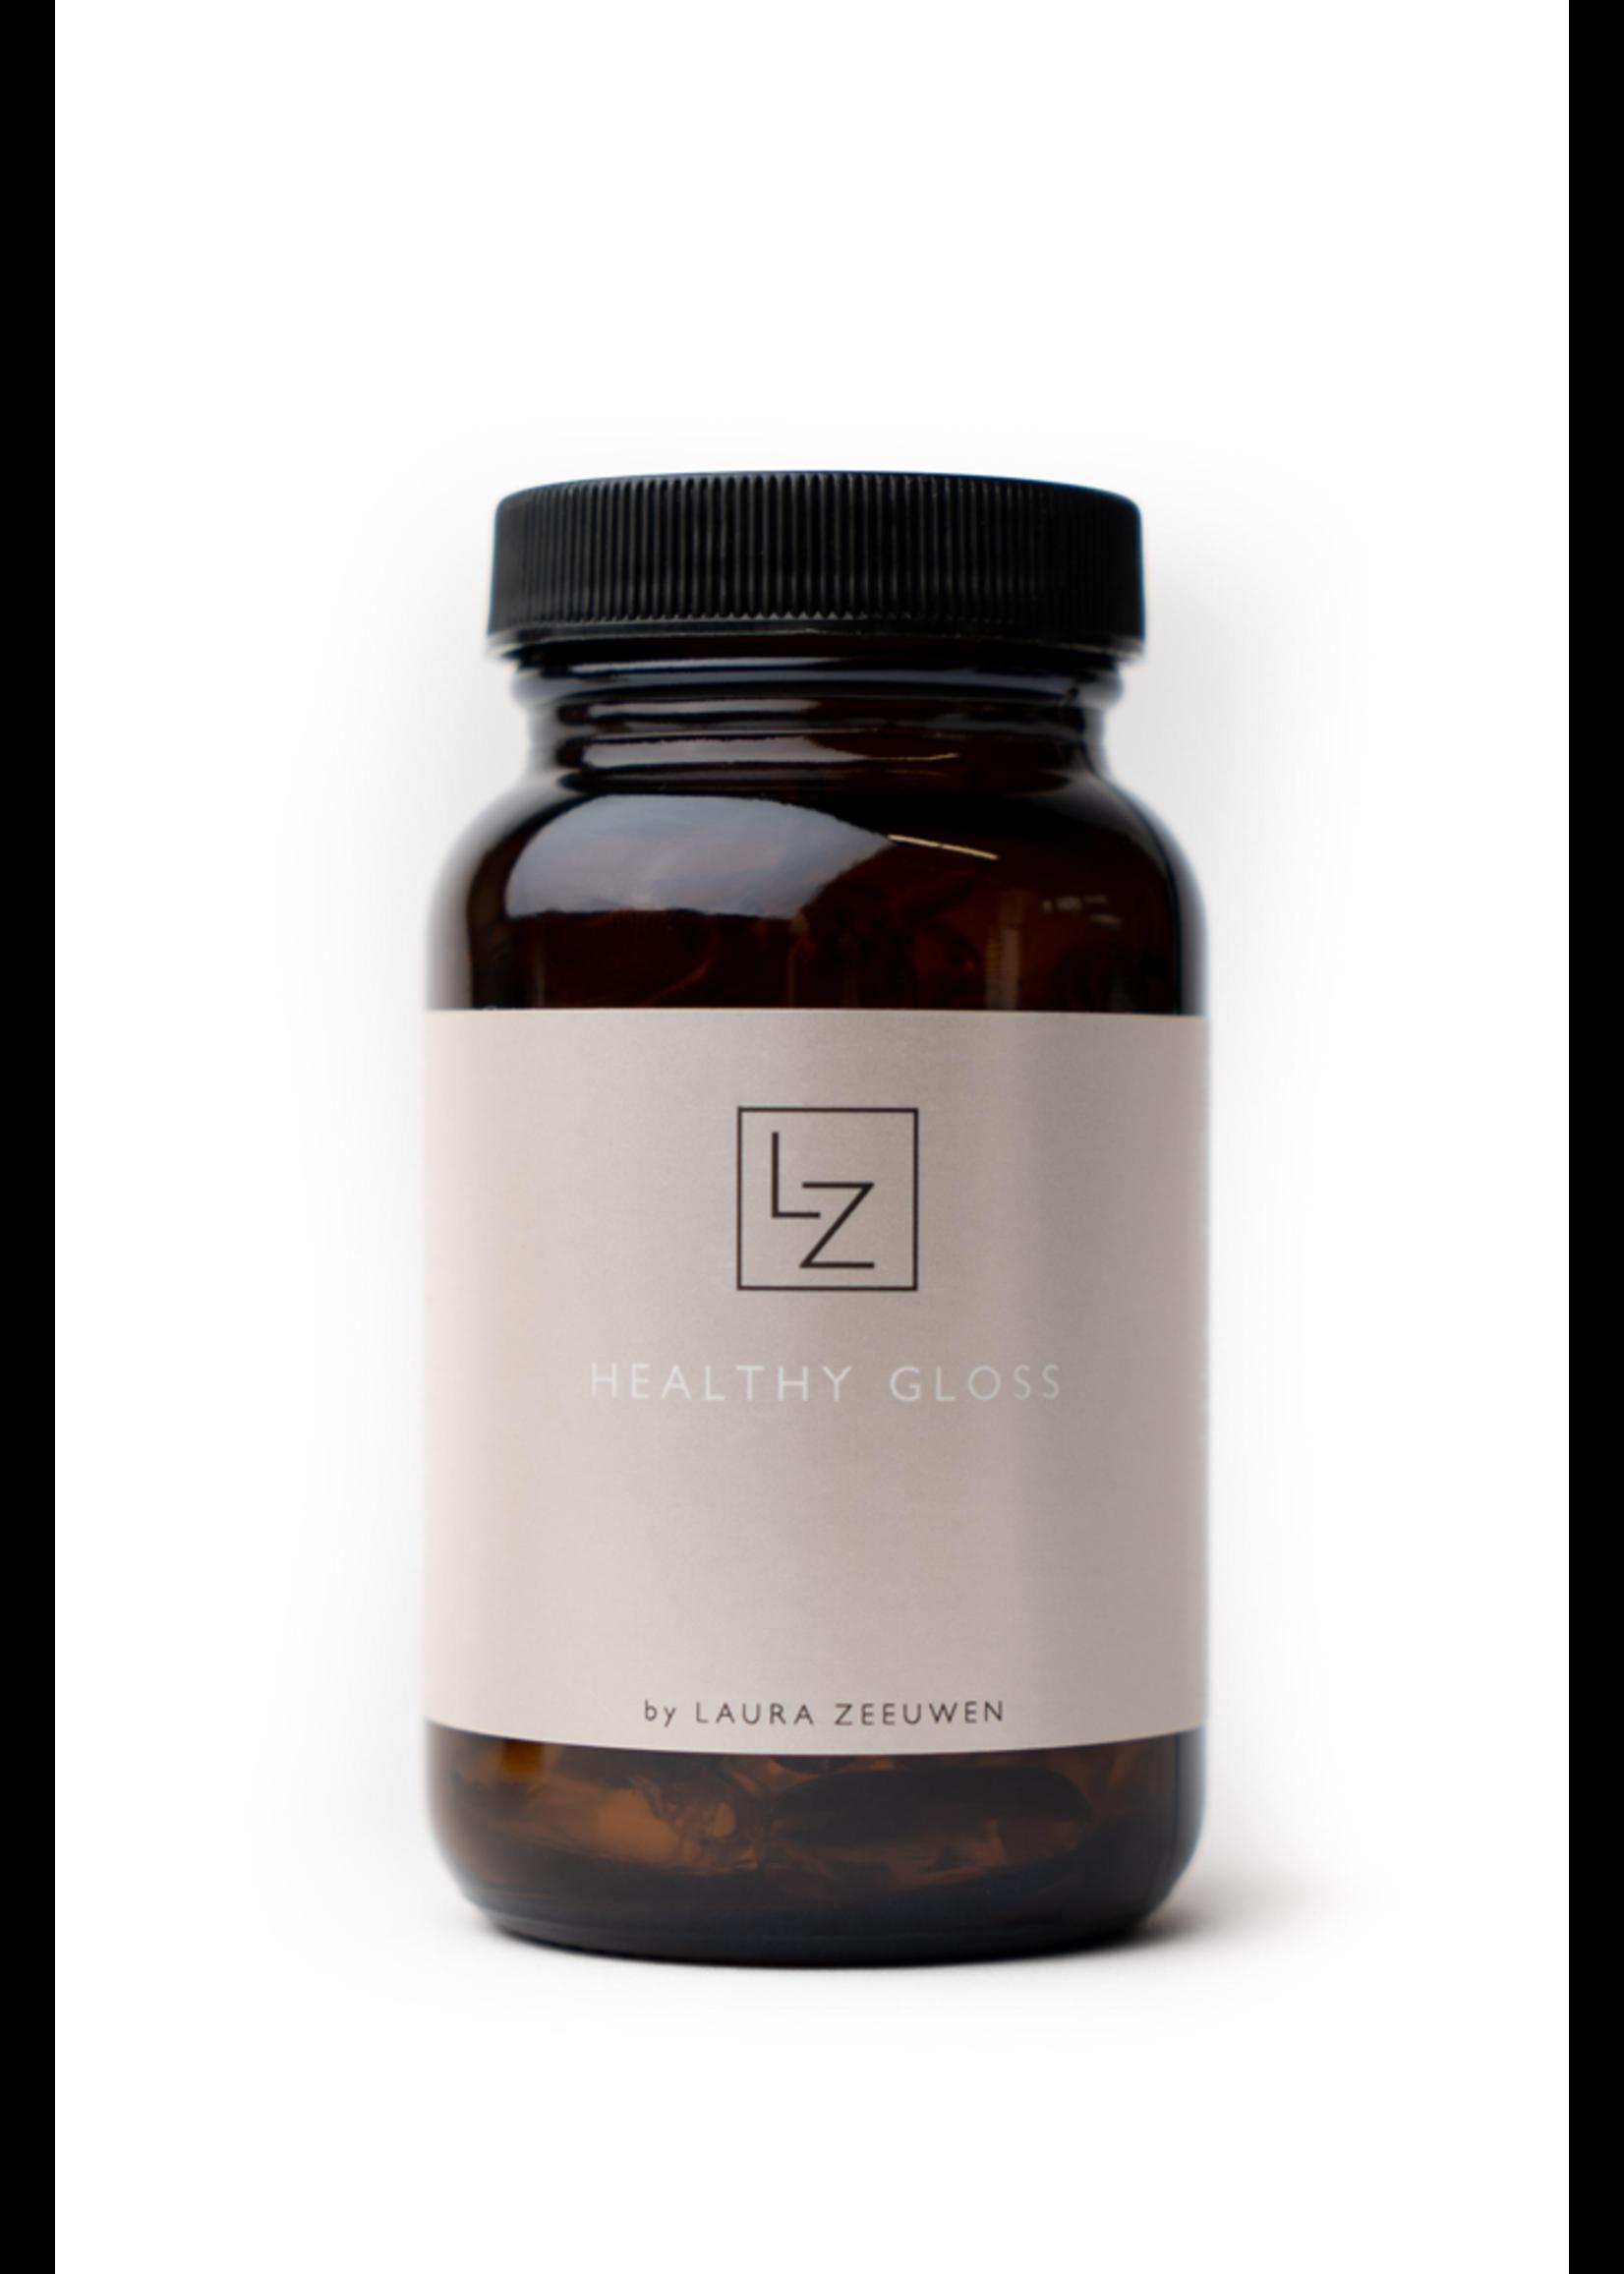 Massive Nutrition + Healthy Gloss